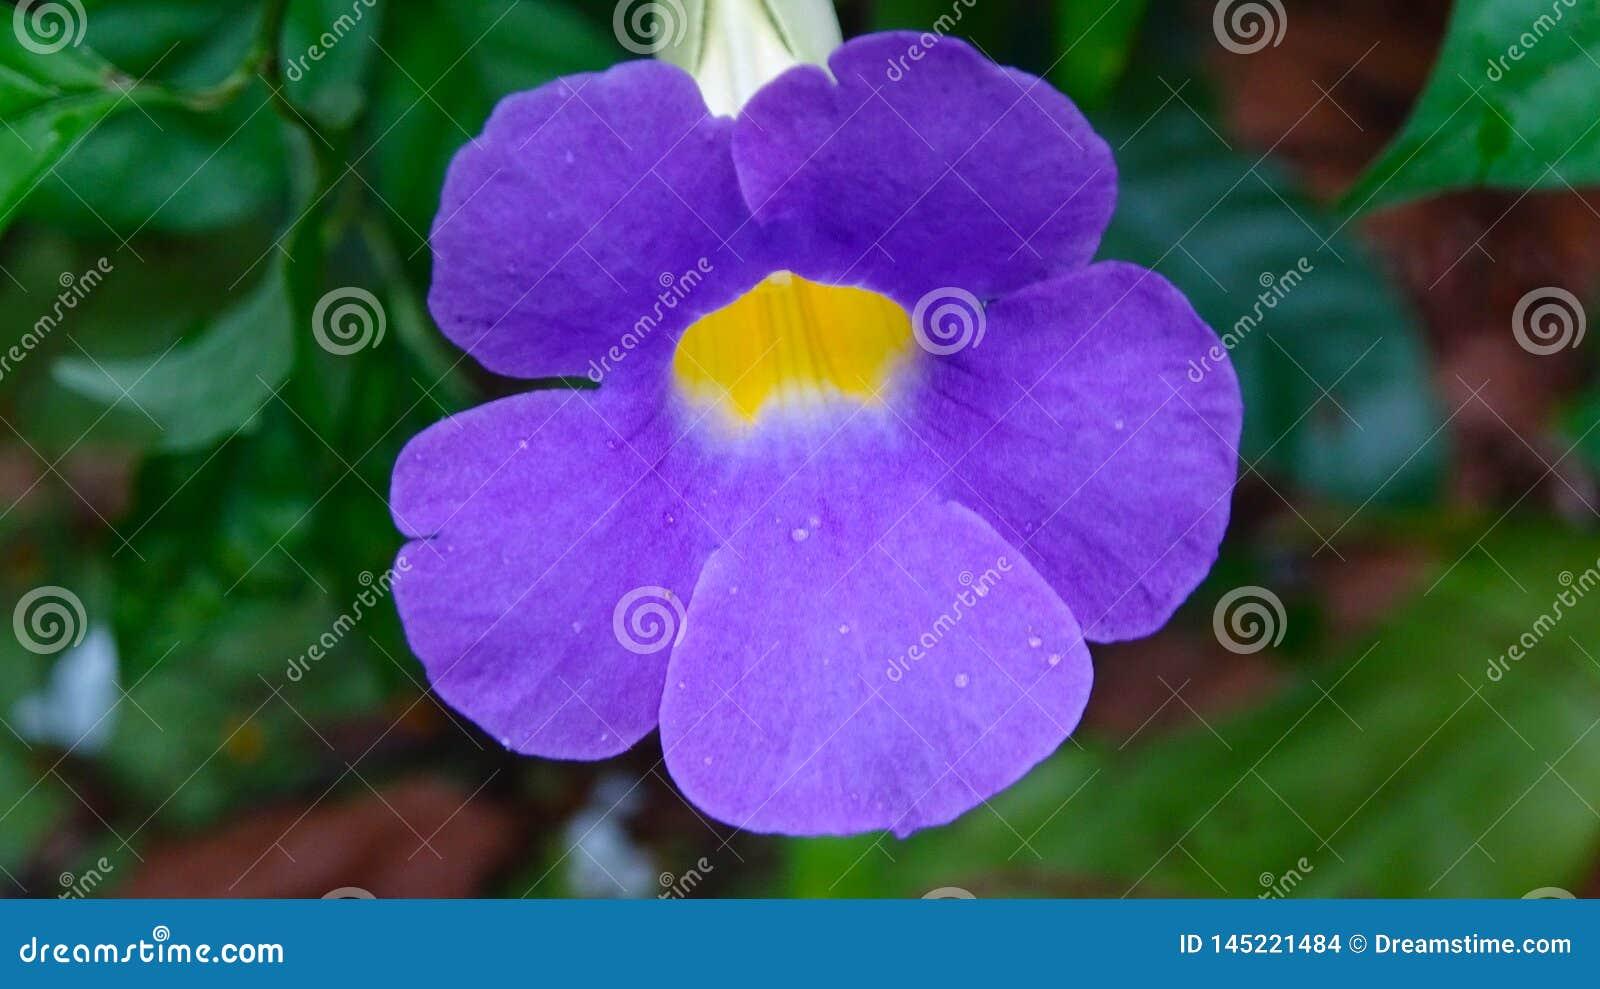 Romantische purpere bloemenillustratie als achtergrond